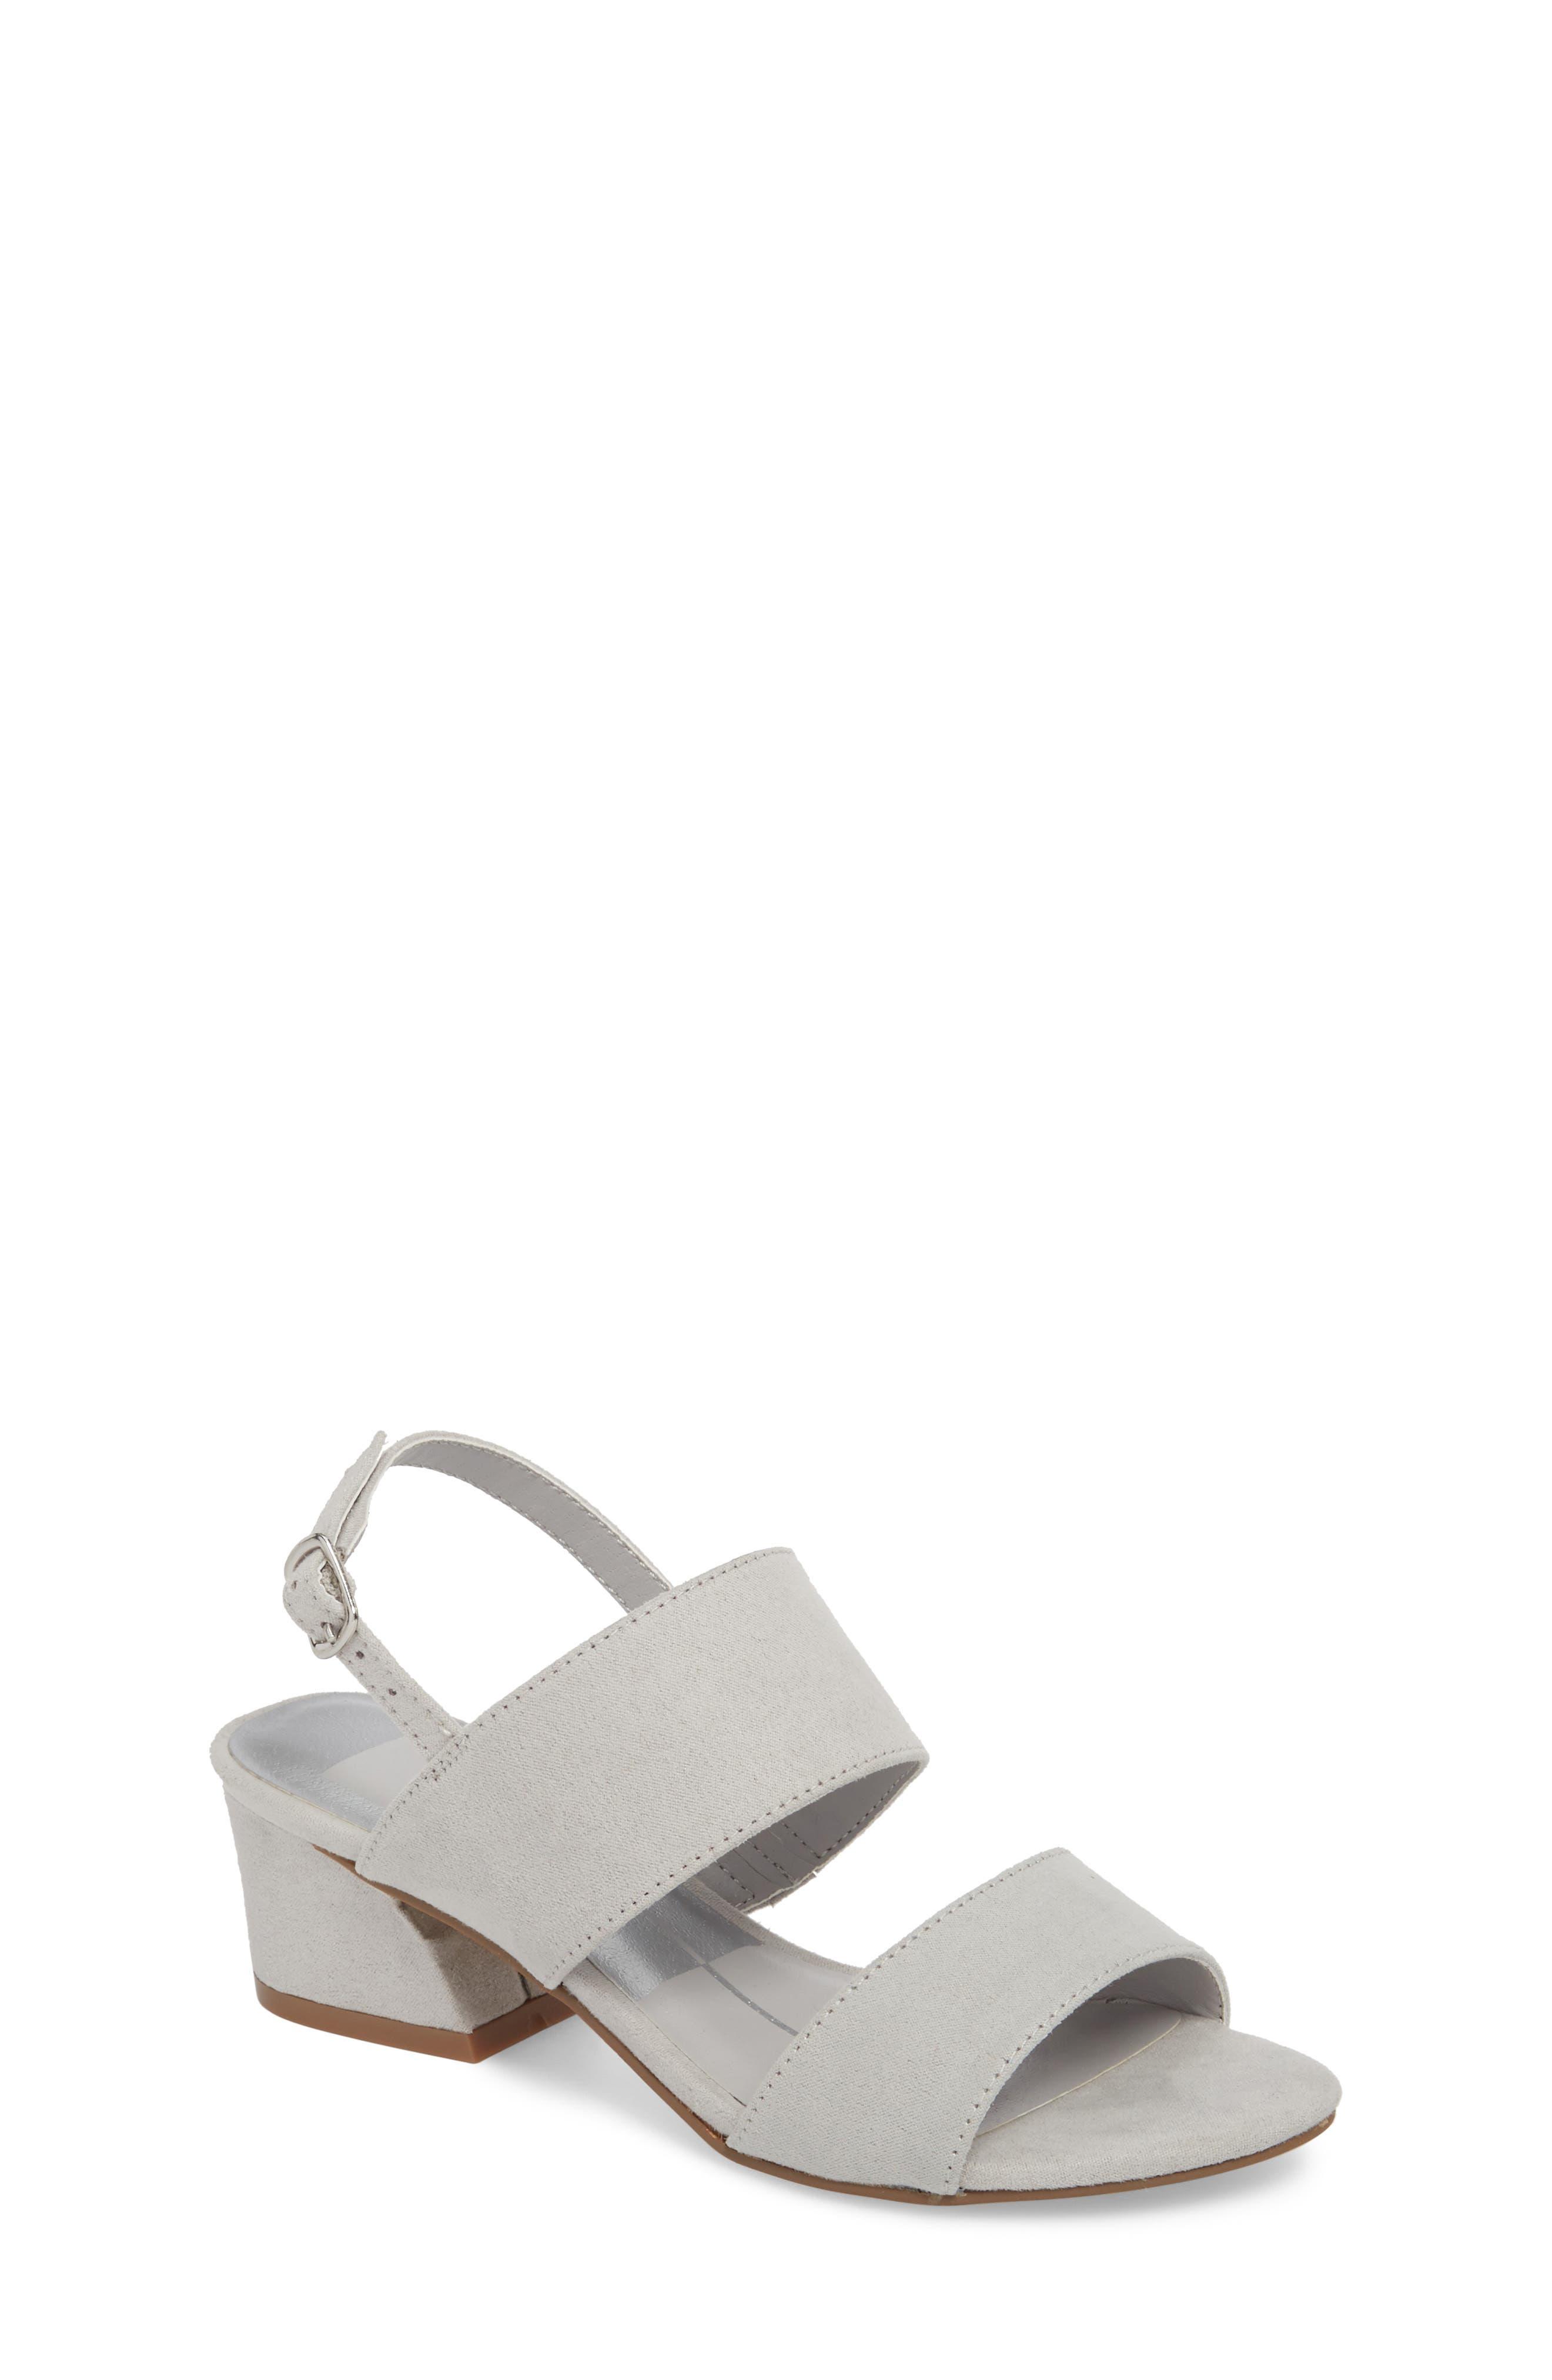 Lorne Flared Heel Sandal,                             Main thumbnail 1, color,                             Light Grey